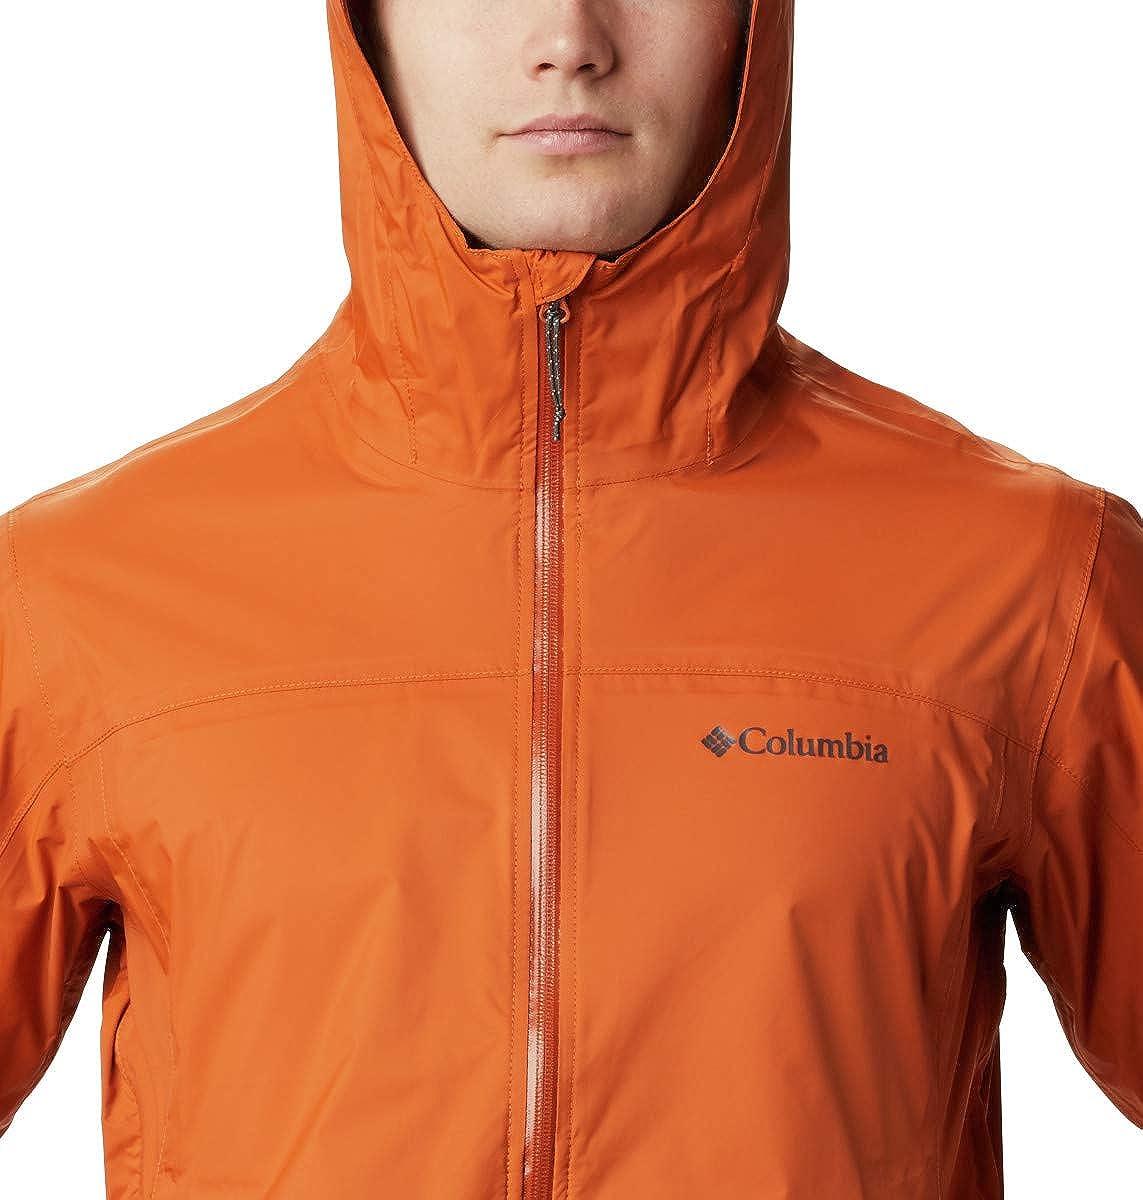 Columbia Mens EvaPURation Waterproof Rain Jacket